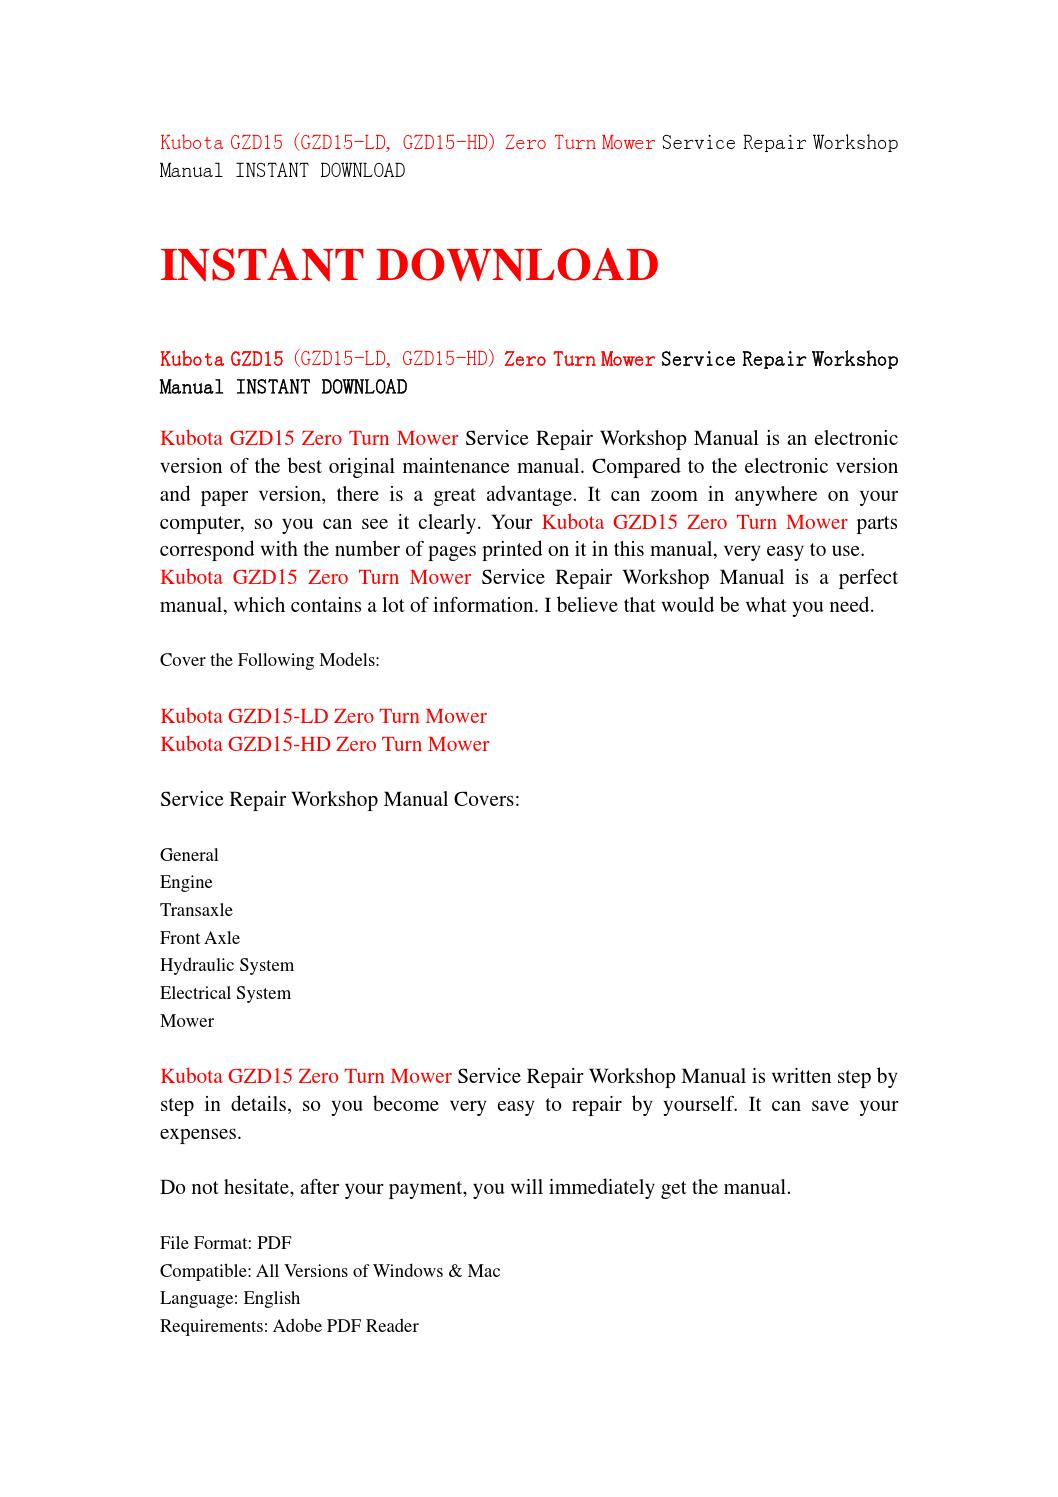 Kubota gzd15 (gzd15 ld, gzd15 hd) zero turn mower service repair workshop  manual instant download by jfhnn mkjnd - issuu